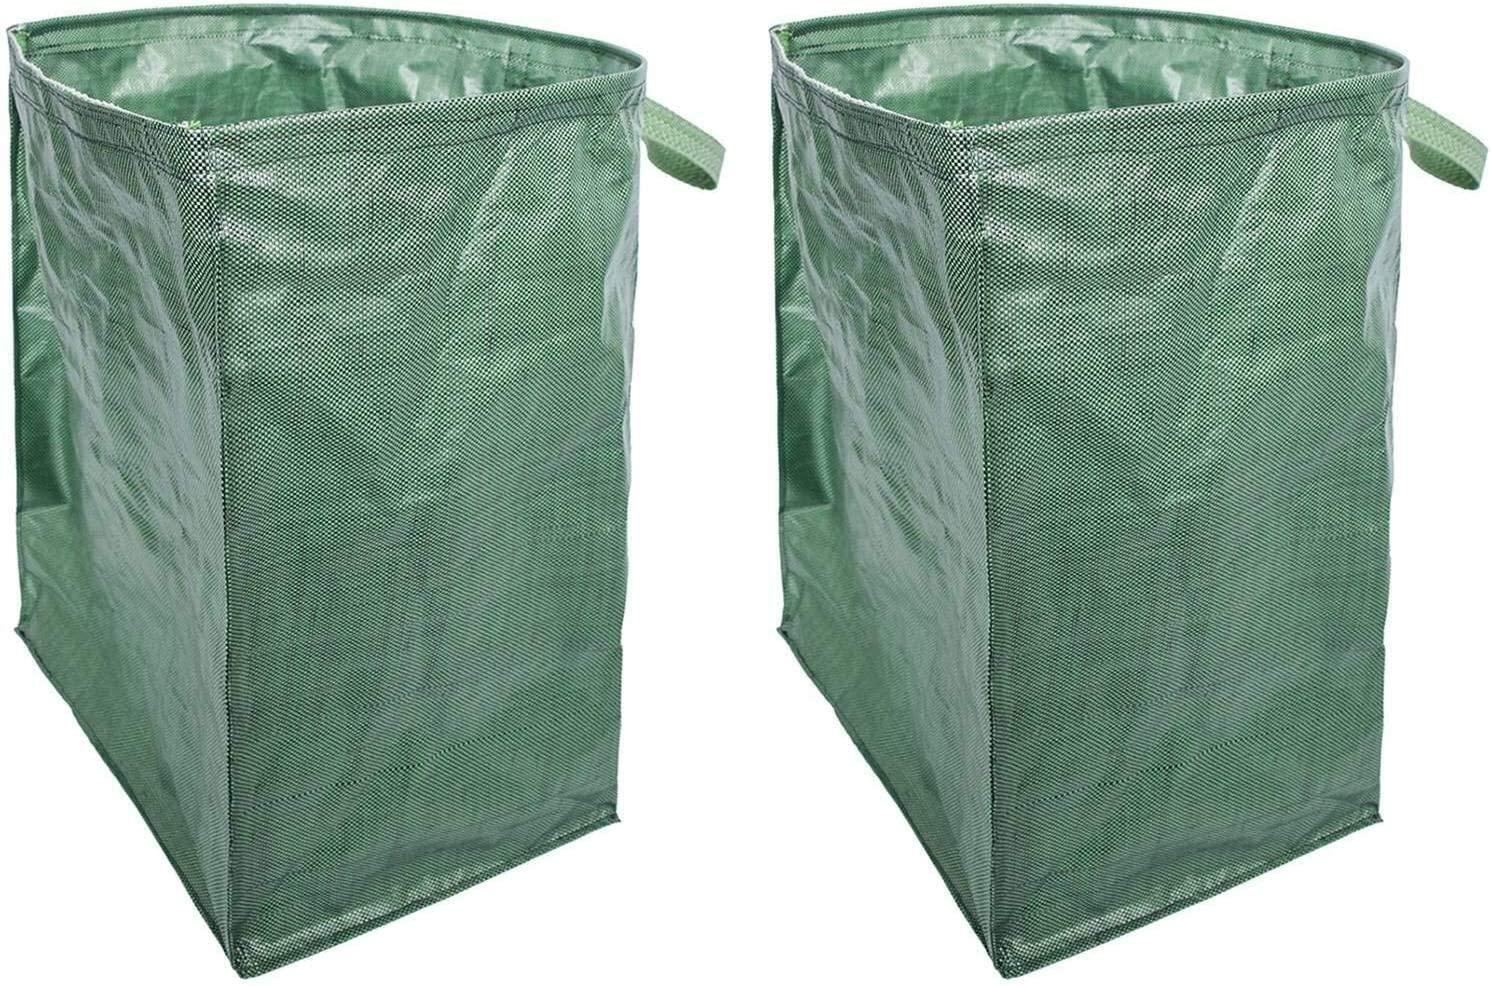 Zxcv Multi-Functional Reusable Heavy-Duty Garden Handbag Large-Capacity Garden Deciduous Bag Leaf Bag Gardening Bag 2 Packs